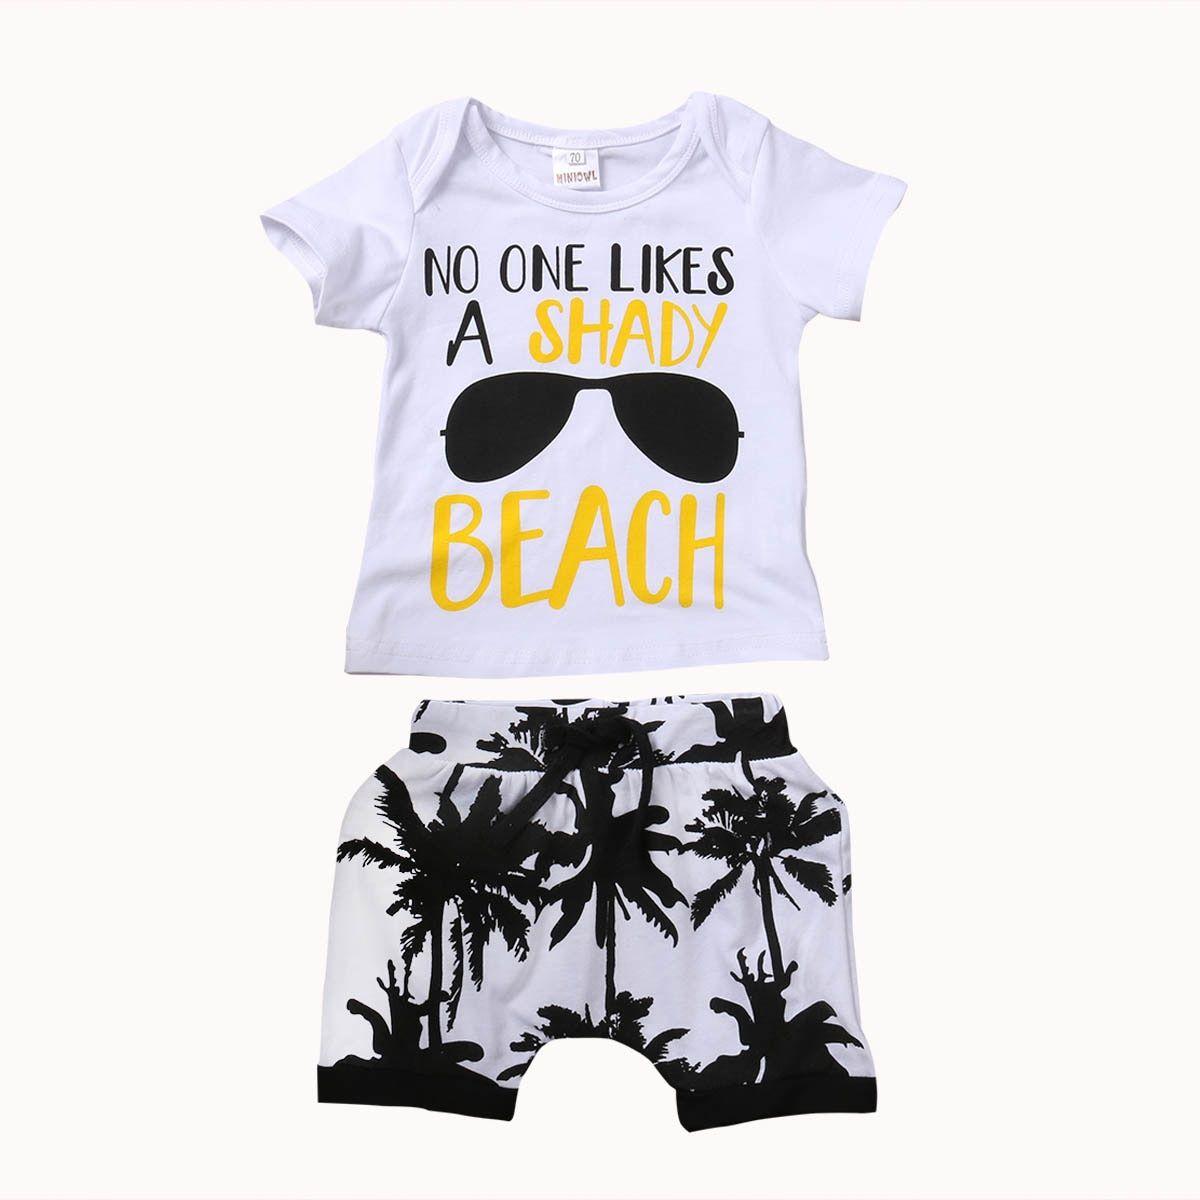 USA 2PCS Toddler Kids Baby Boy Outfits Clothes Cotton T-shirt+Shorts Pants Sets